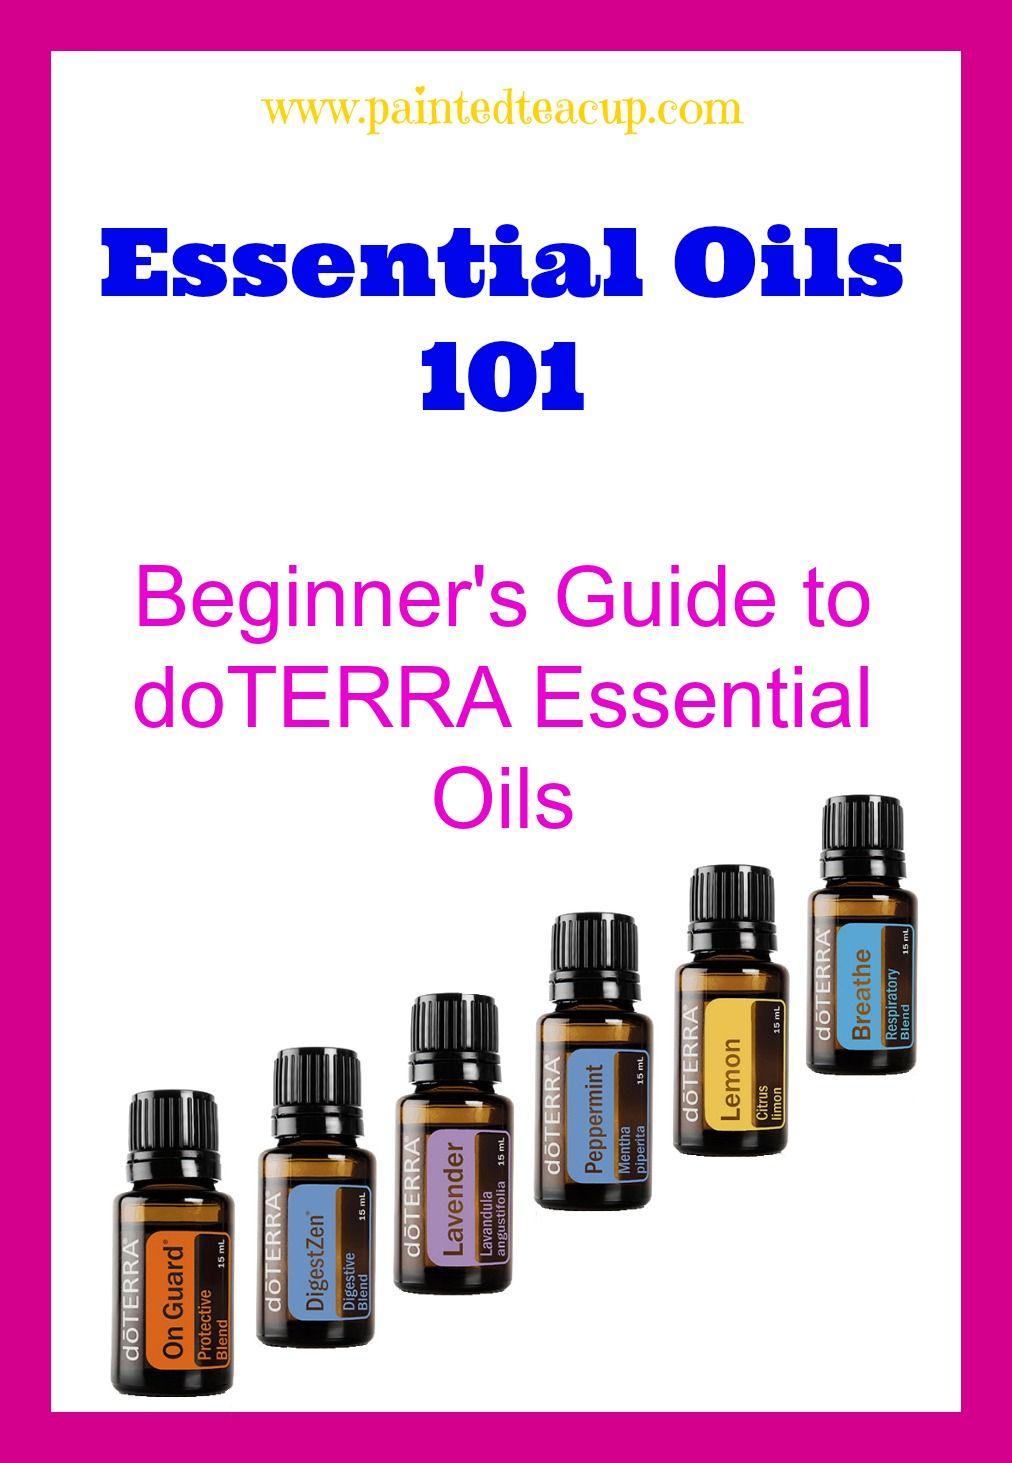 Essential Oils 101: Beginner's Guide to doTERRA Essential Oils. How to use  doTERRA essential oils. www.paintedteacup.com